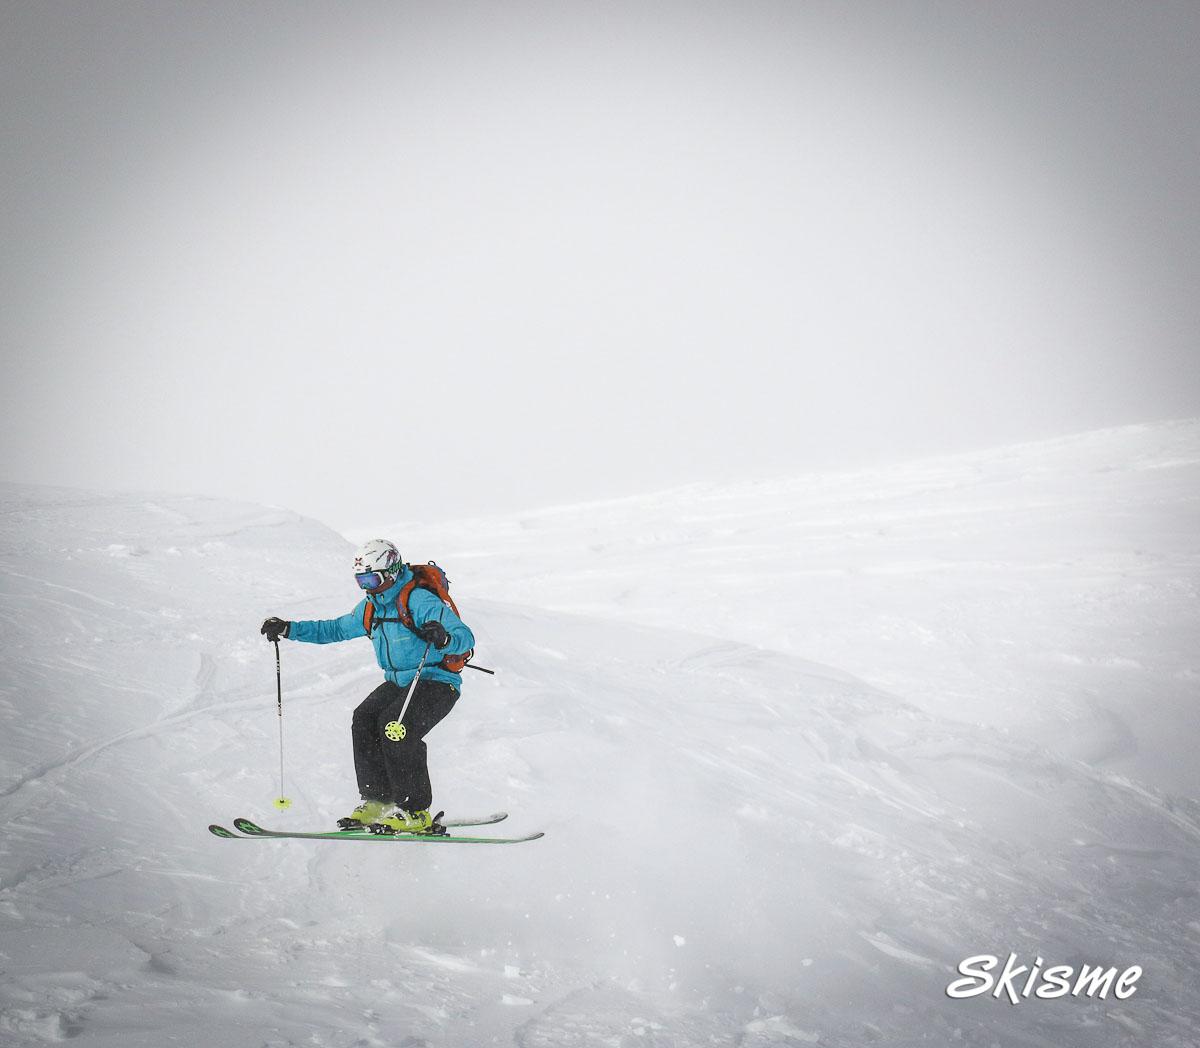 002 Livigno off piste, Skisme